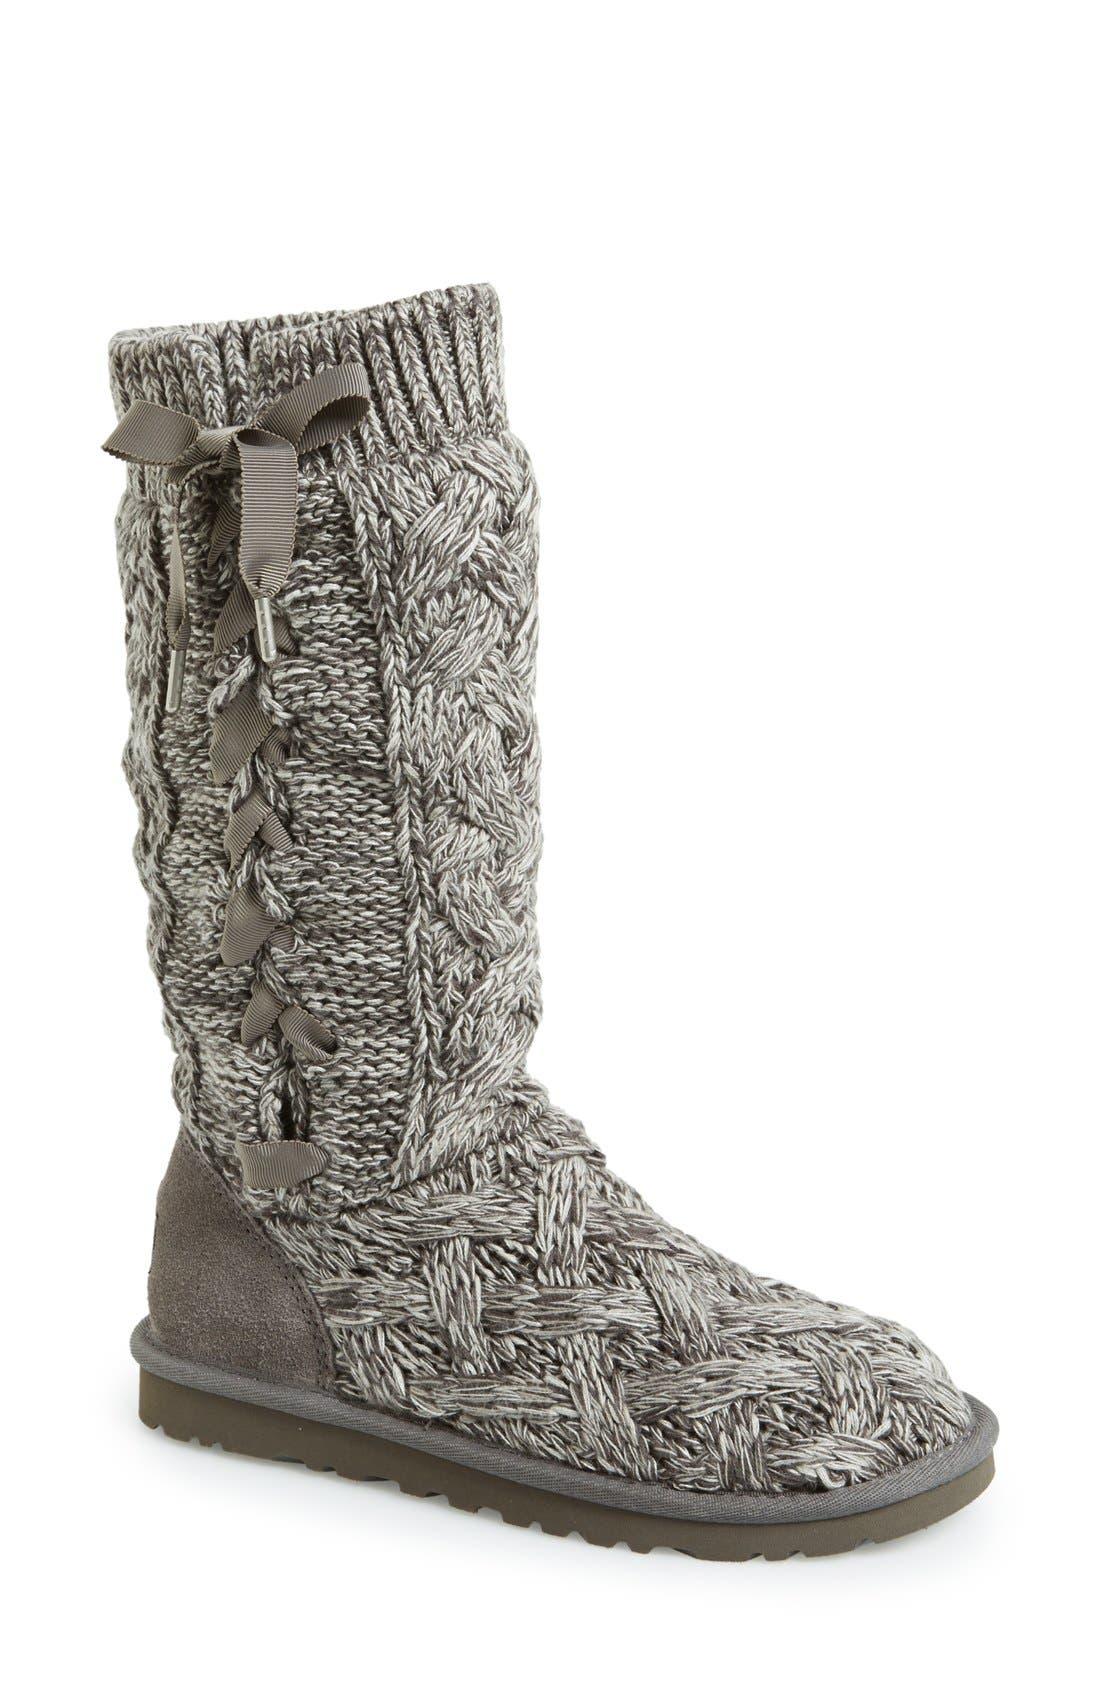 Alternate Image 1 Selected - UGG® Australia 'Mahalya' Knit Boot (Women)